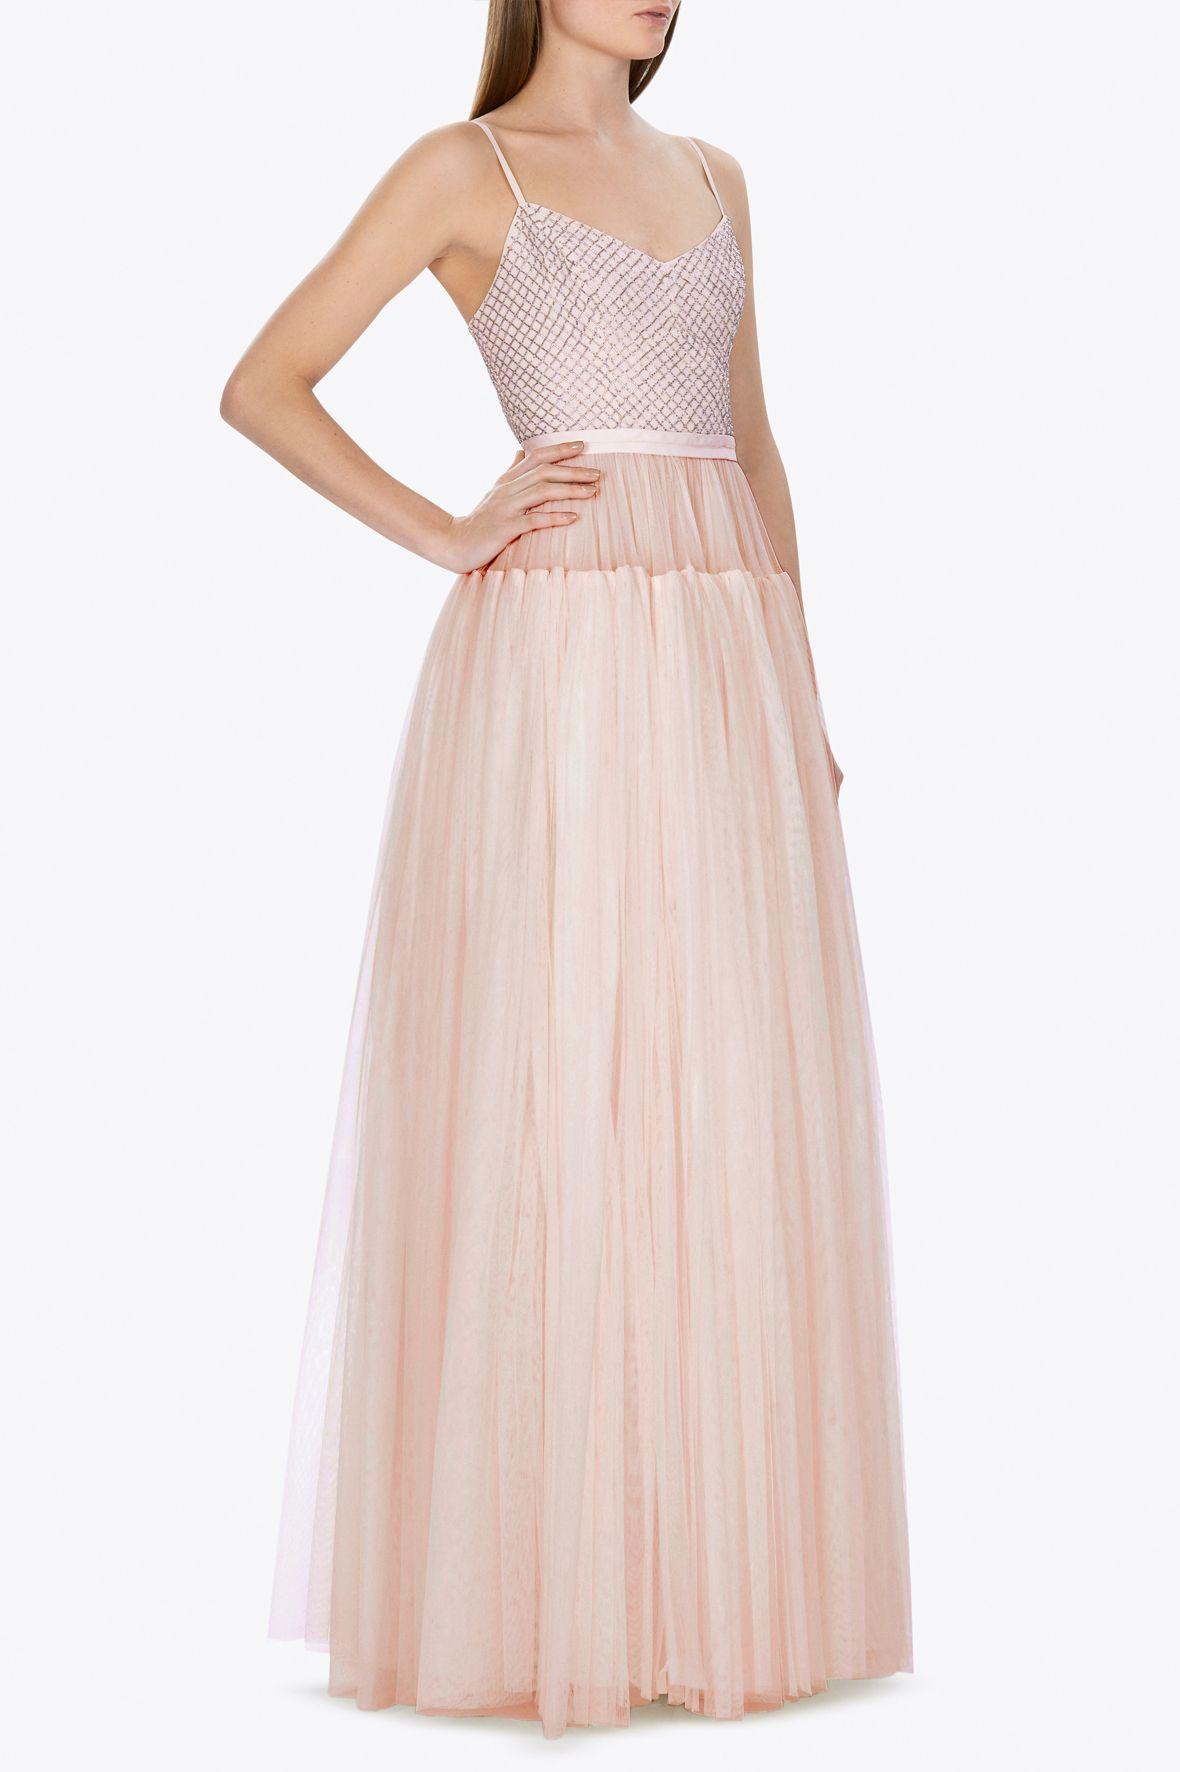 BRIDAL BLUSH VOLUMINOUS MAXI DRESS